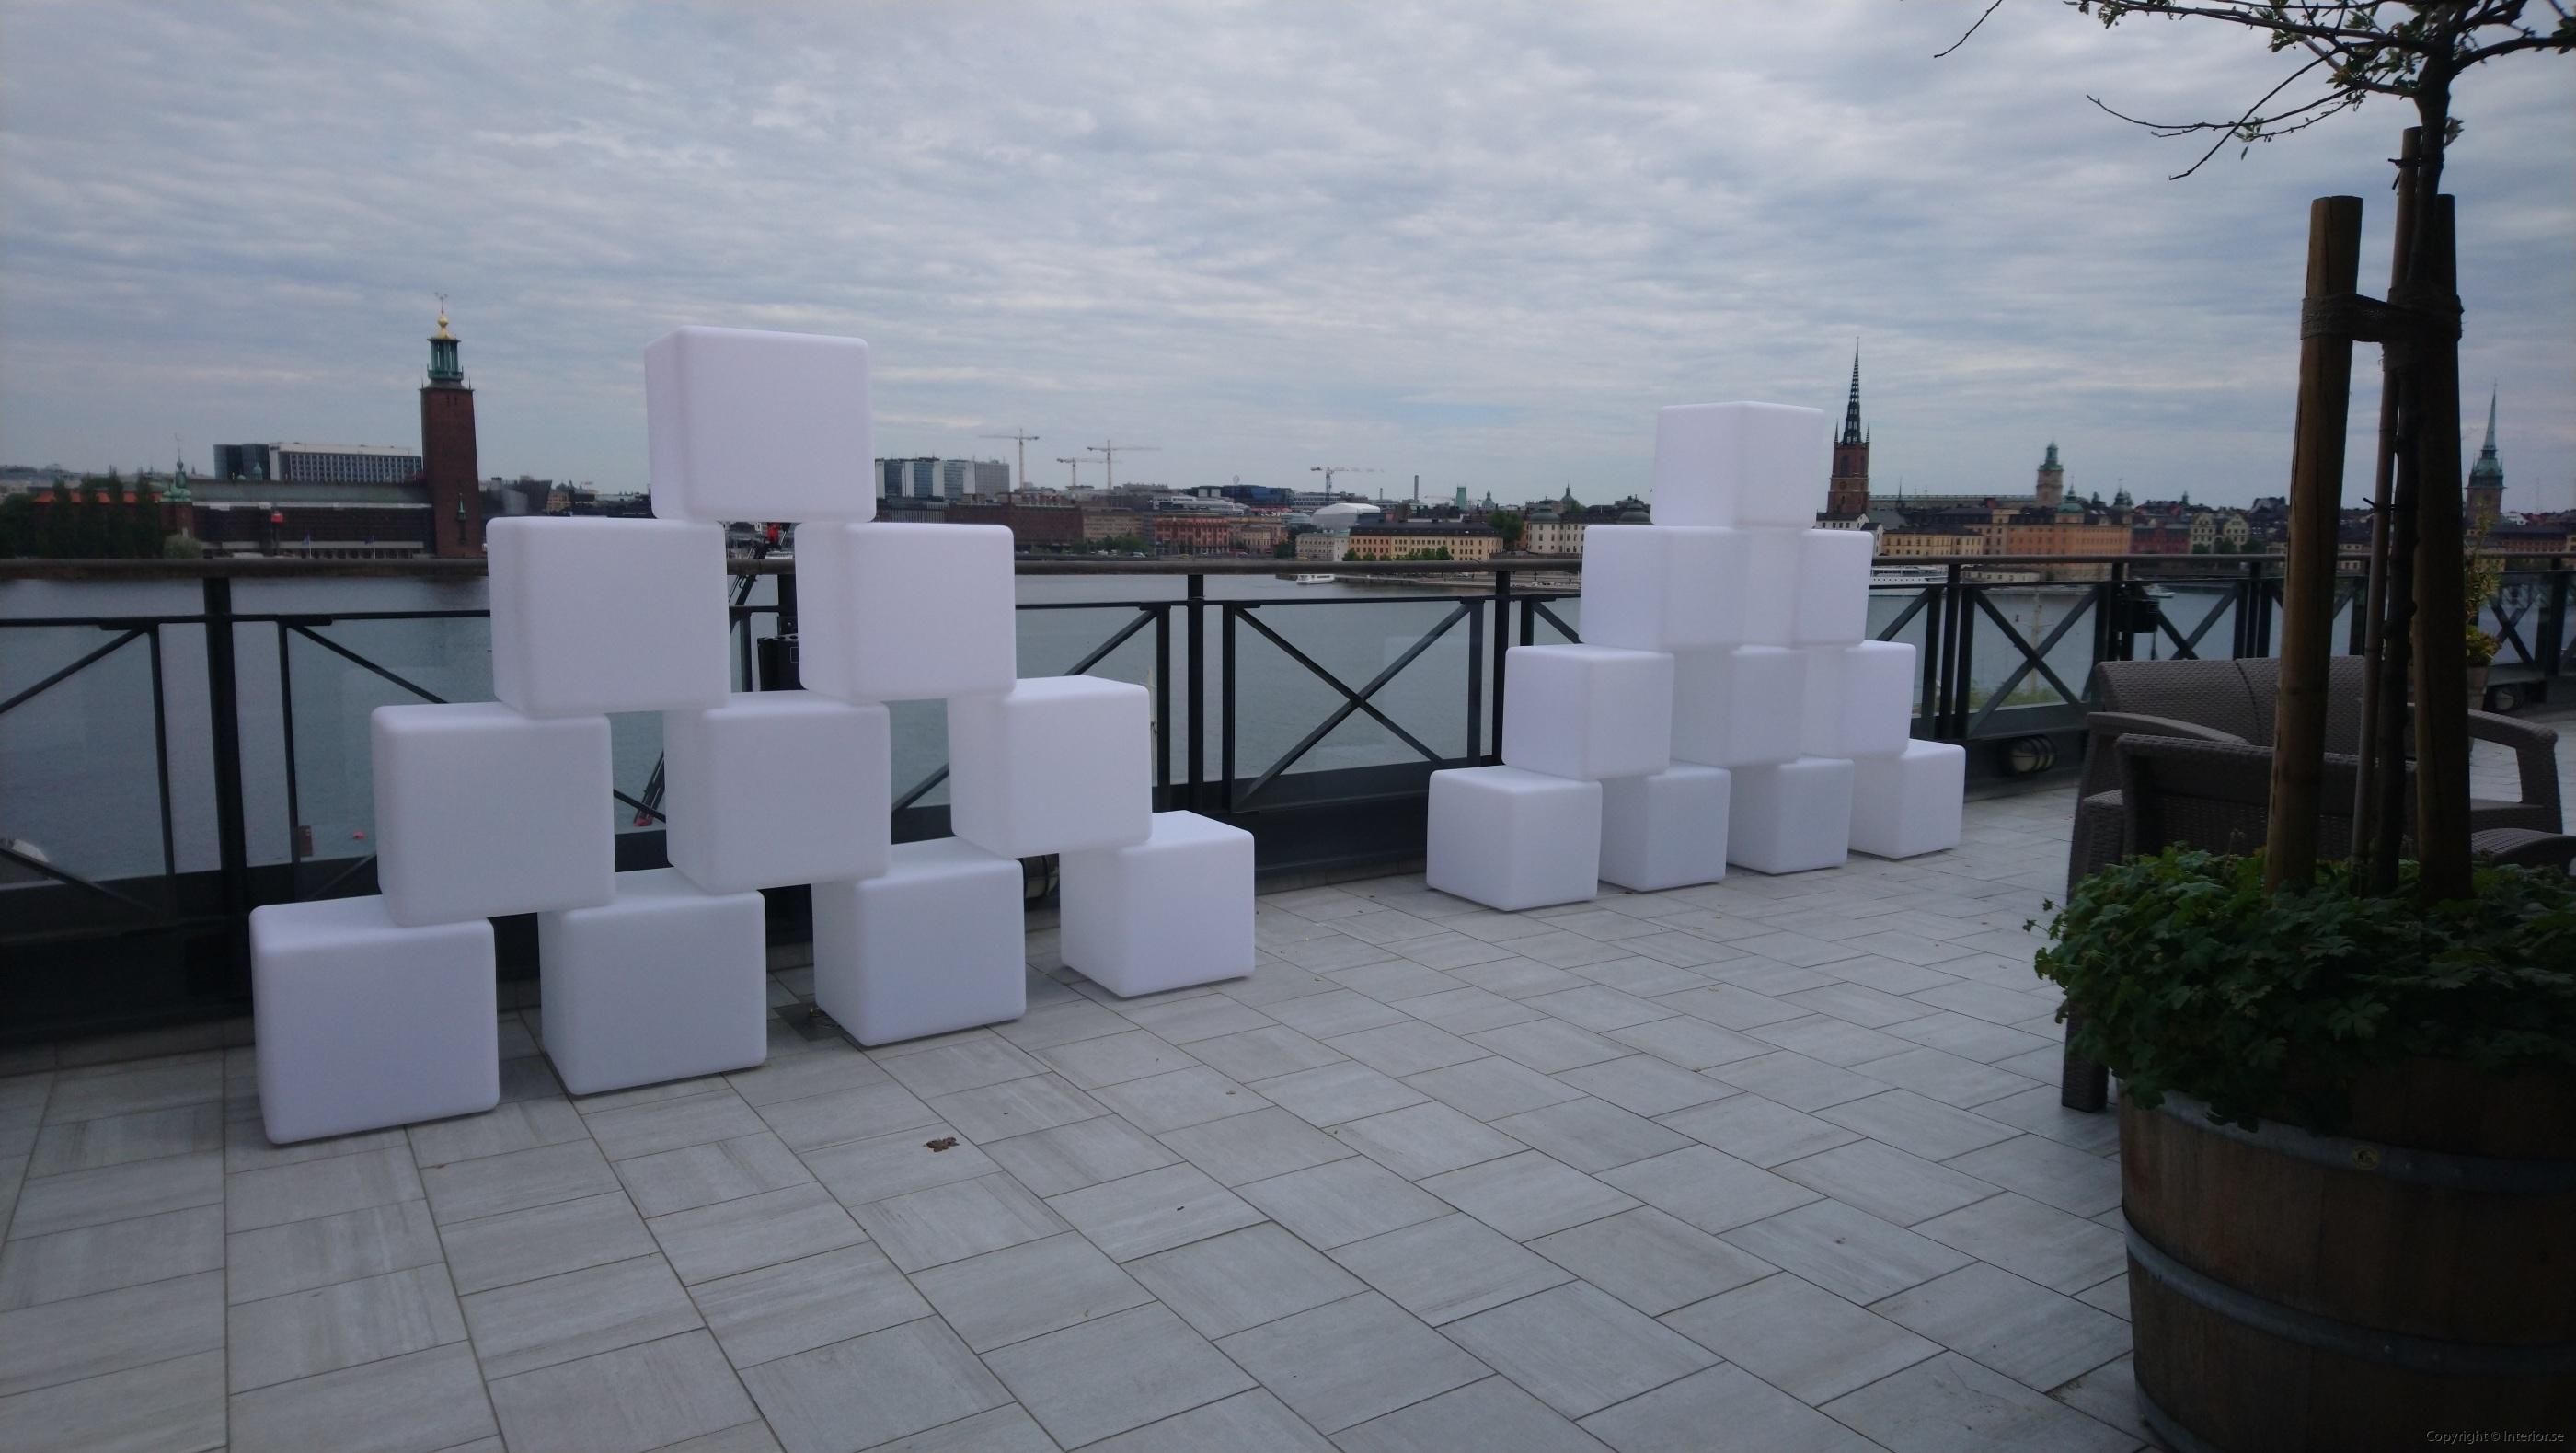 Hyra LED kuber  Pallar 40 x 40 cm - RGB LED hyra möbler event stockholm (2)